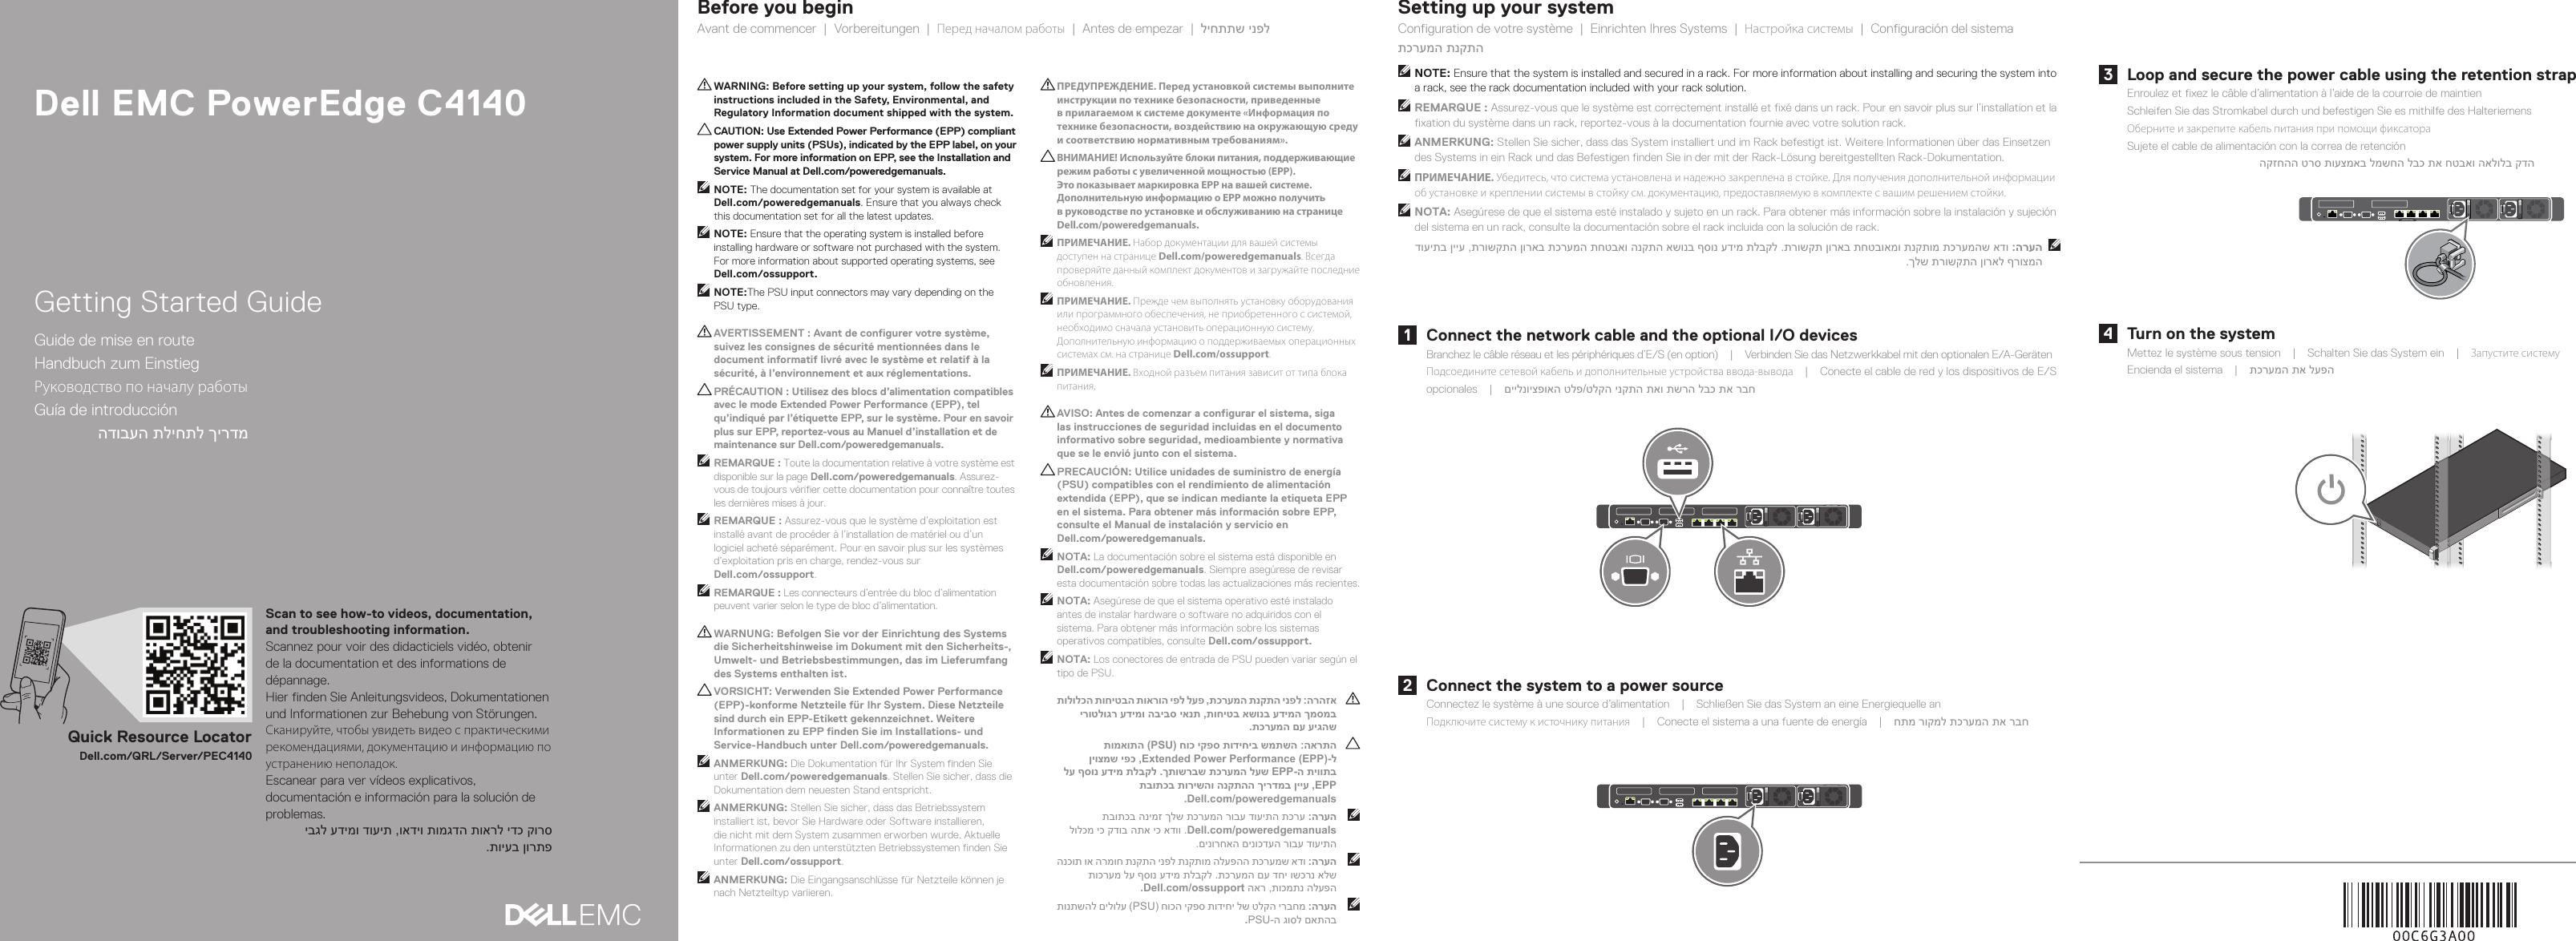 Dell Poweredge c4140 EMC מדריך לתחילת העבודה User Manual